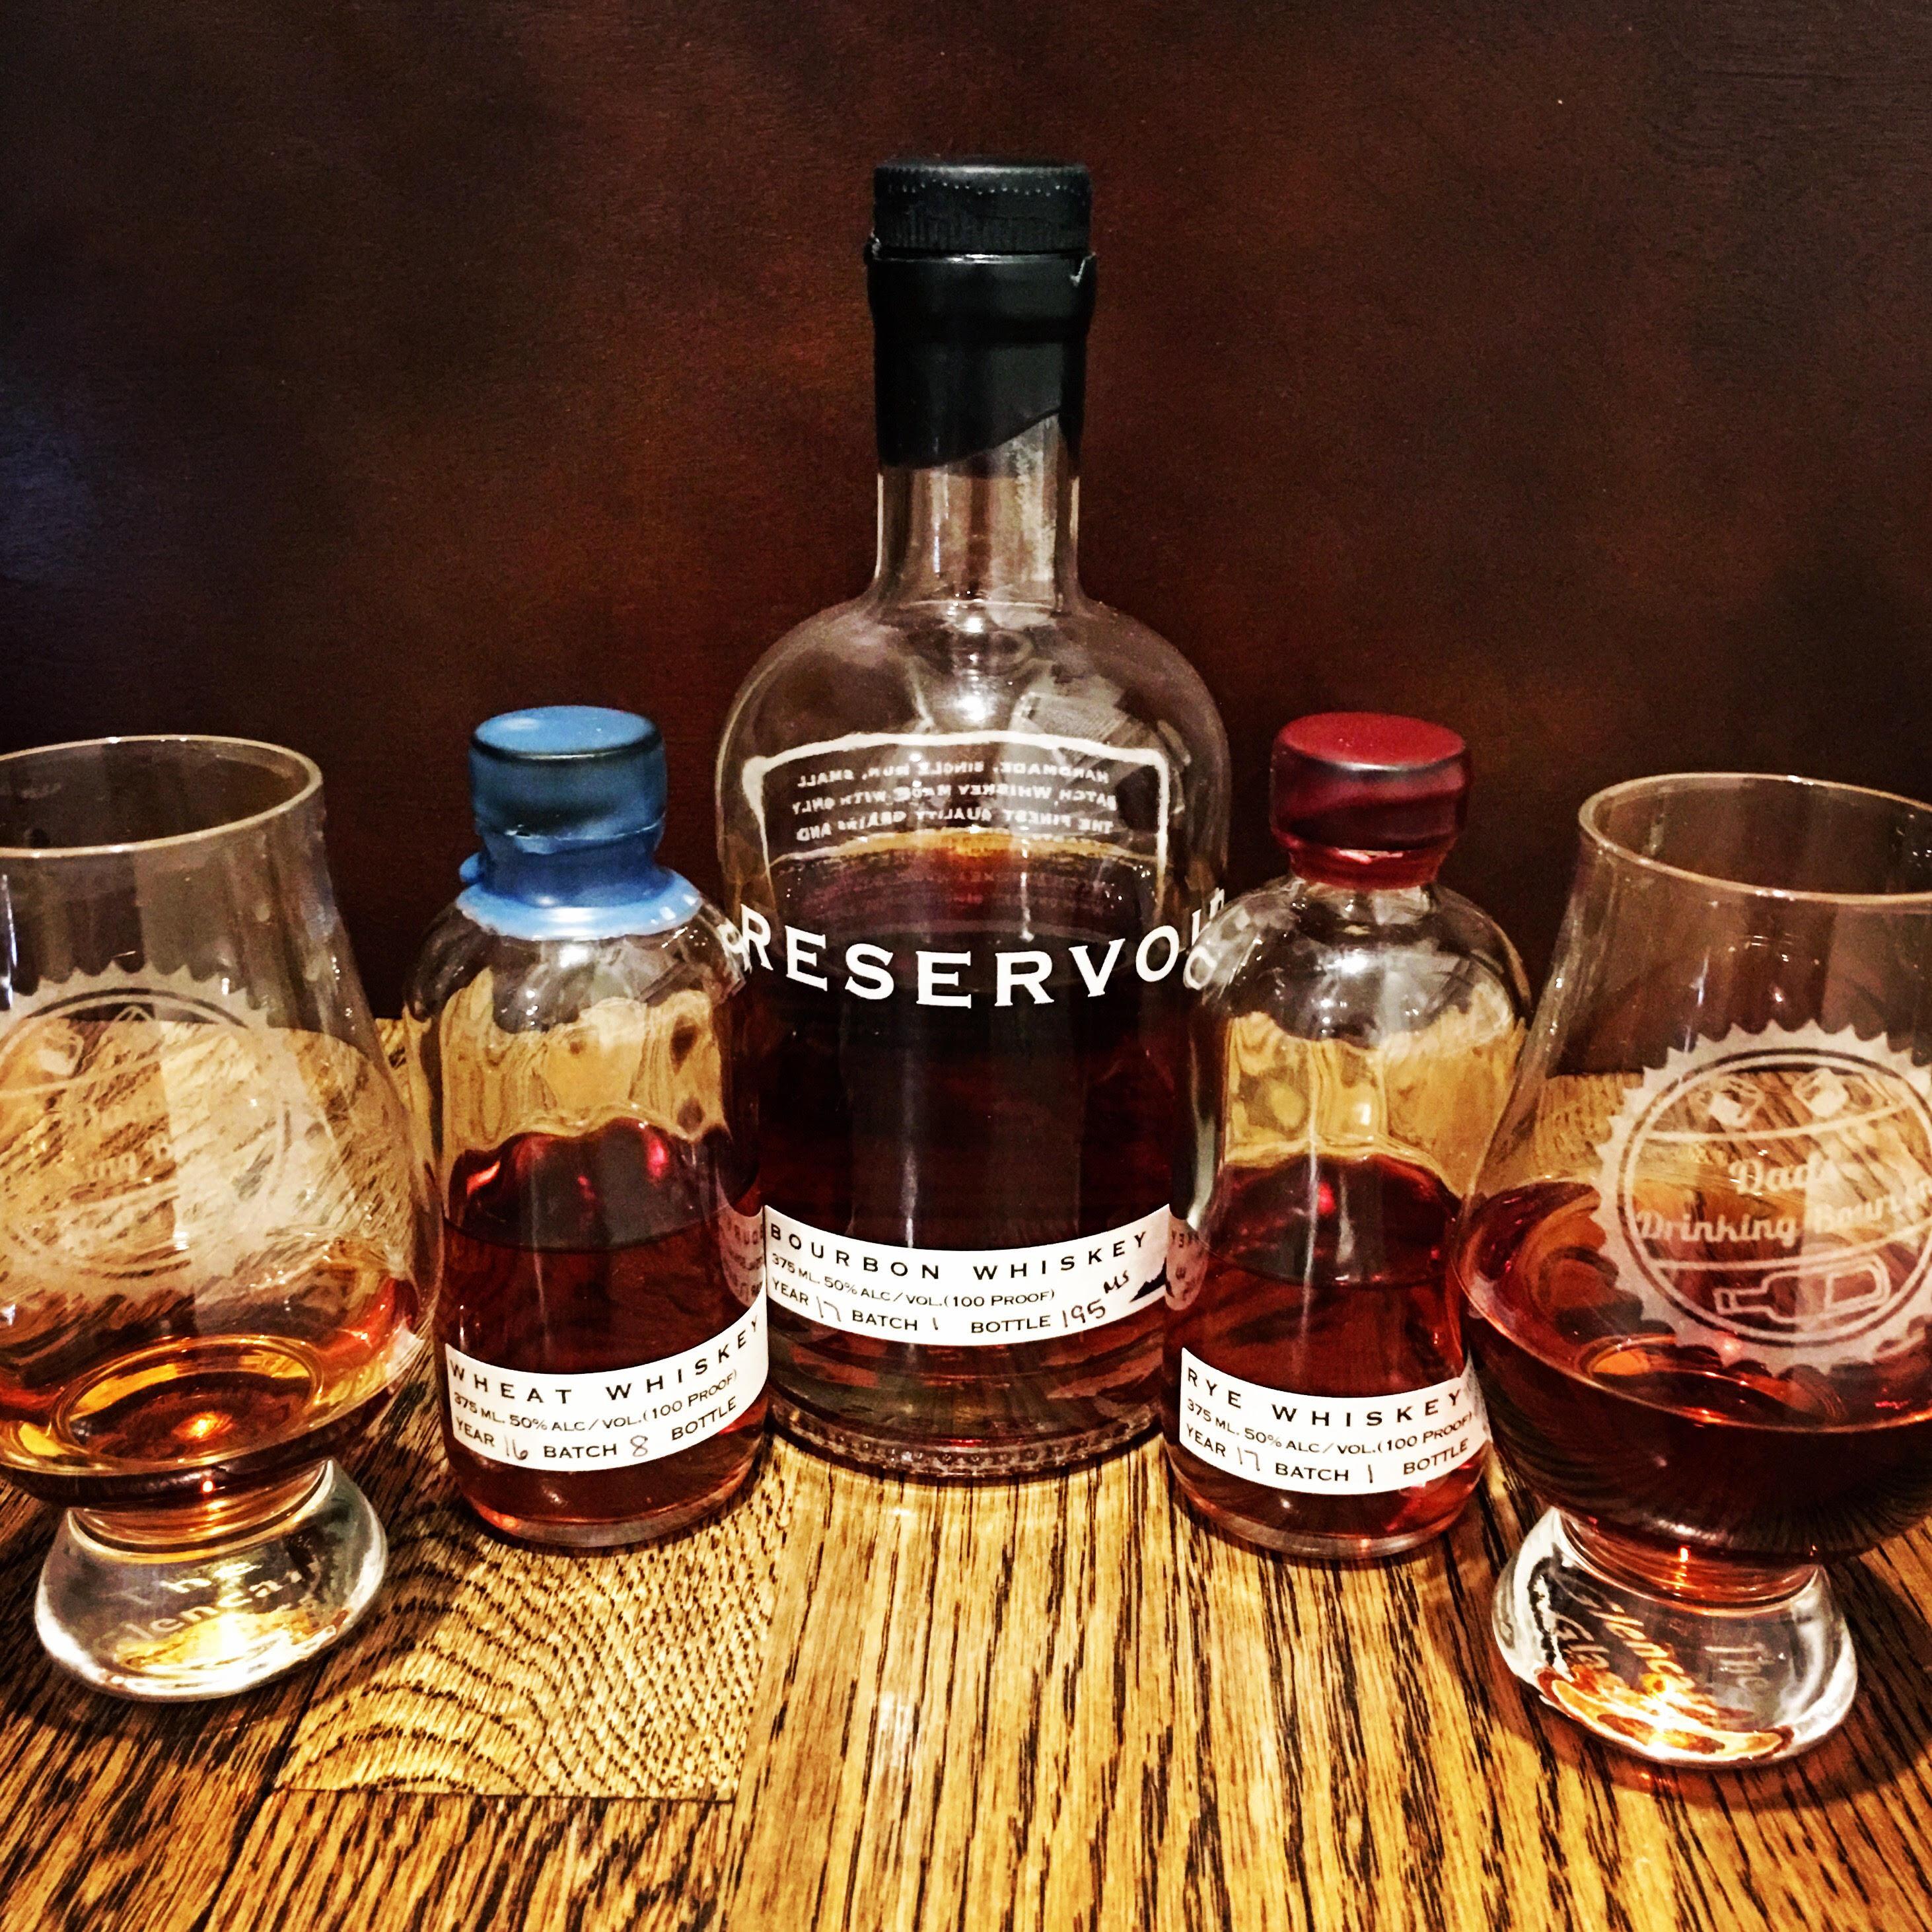 Reservoir Bourbon, Wheat, and Rye